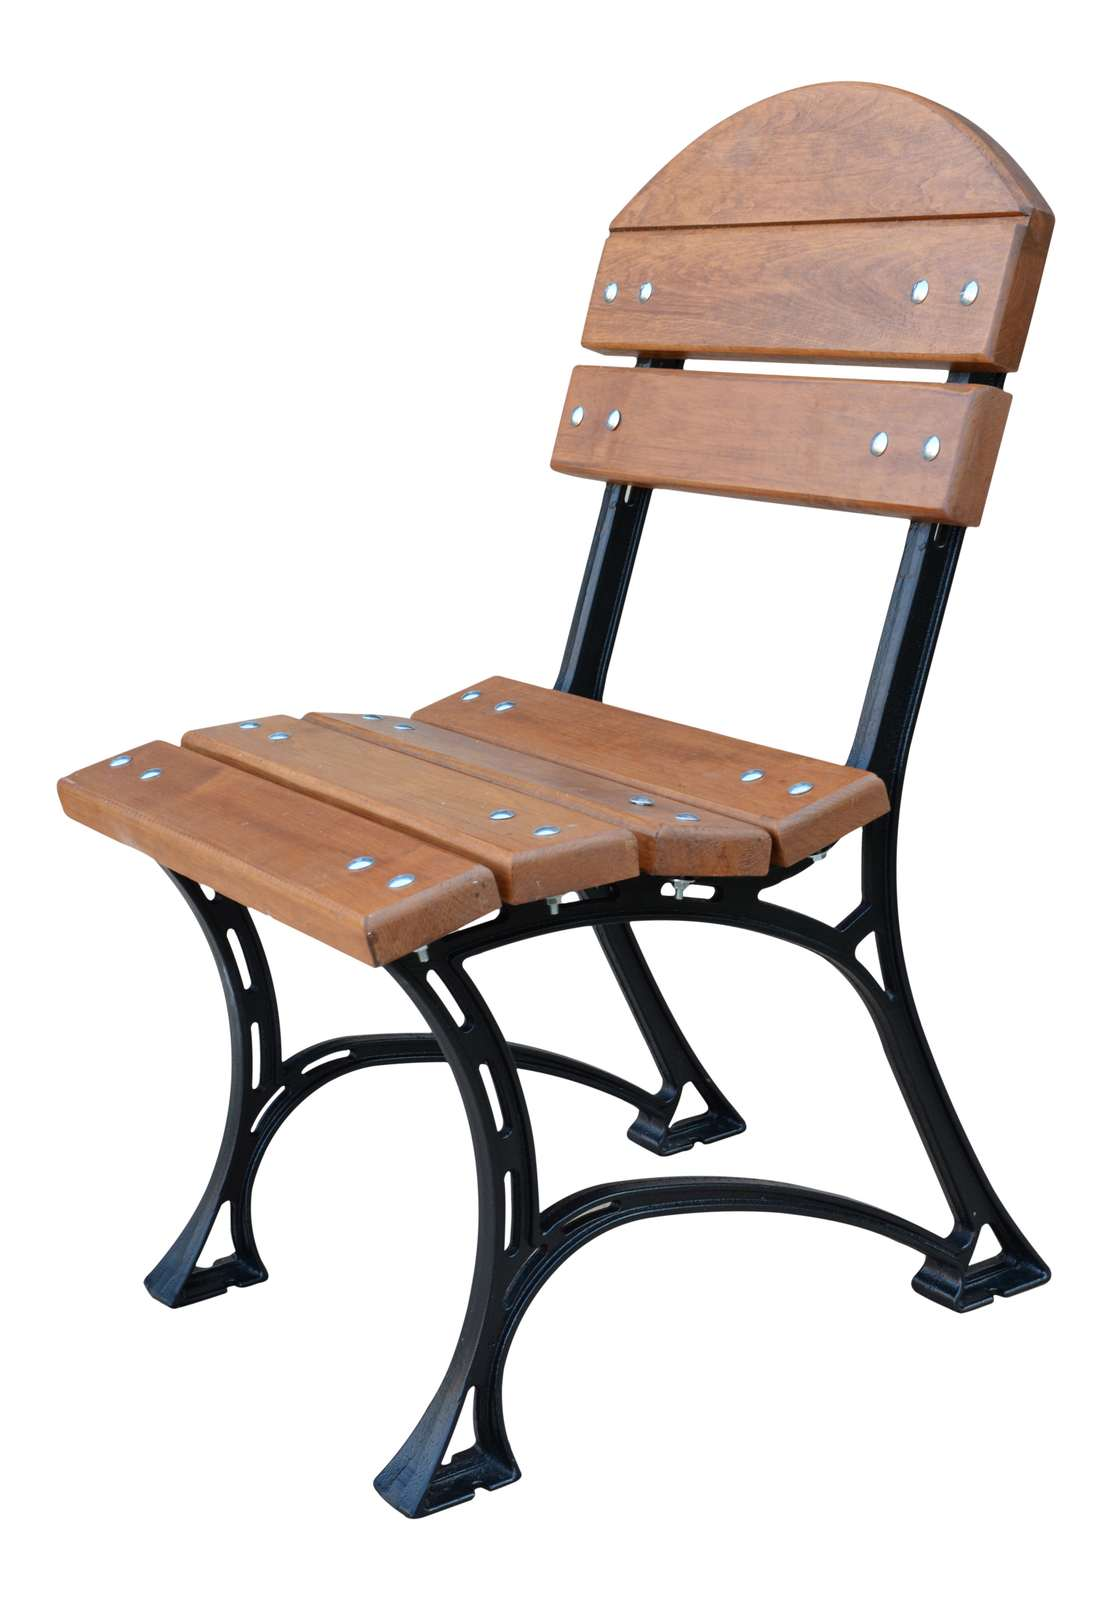 krzeslo zeliwne do ogrodu